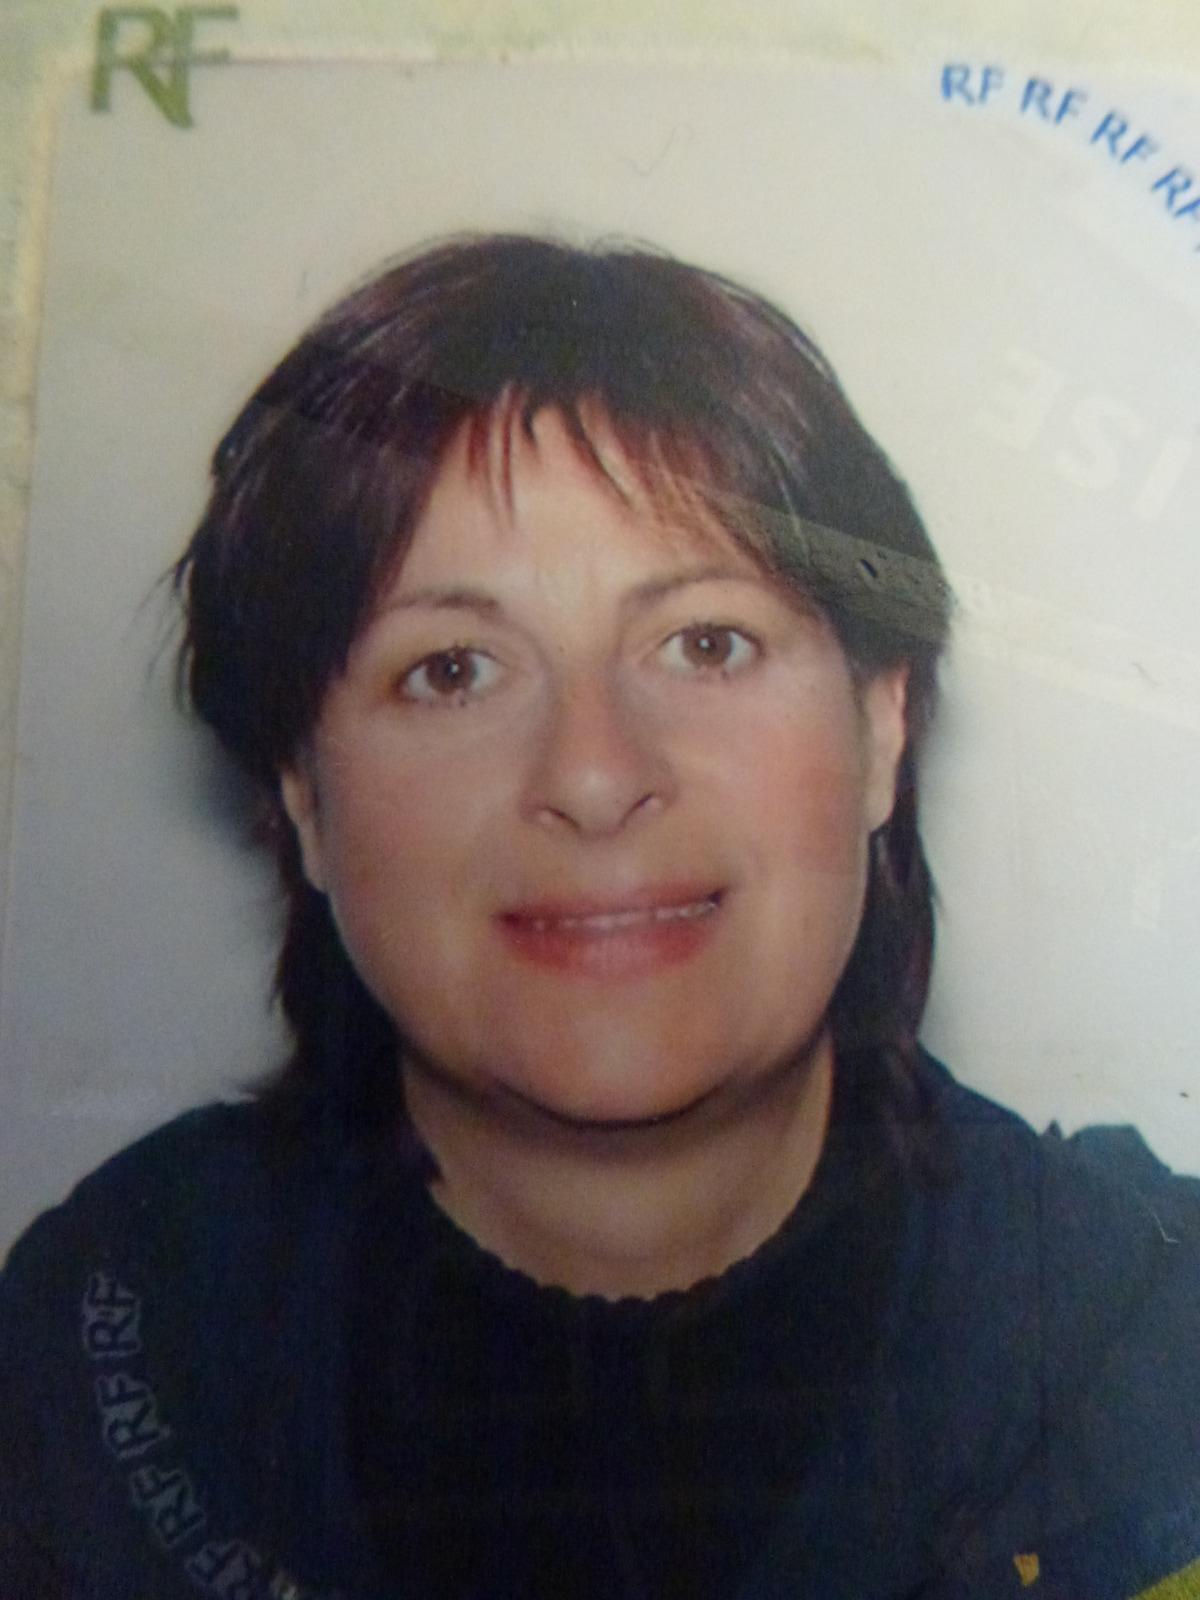 Thérèse from Perpignan